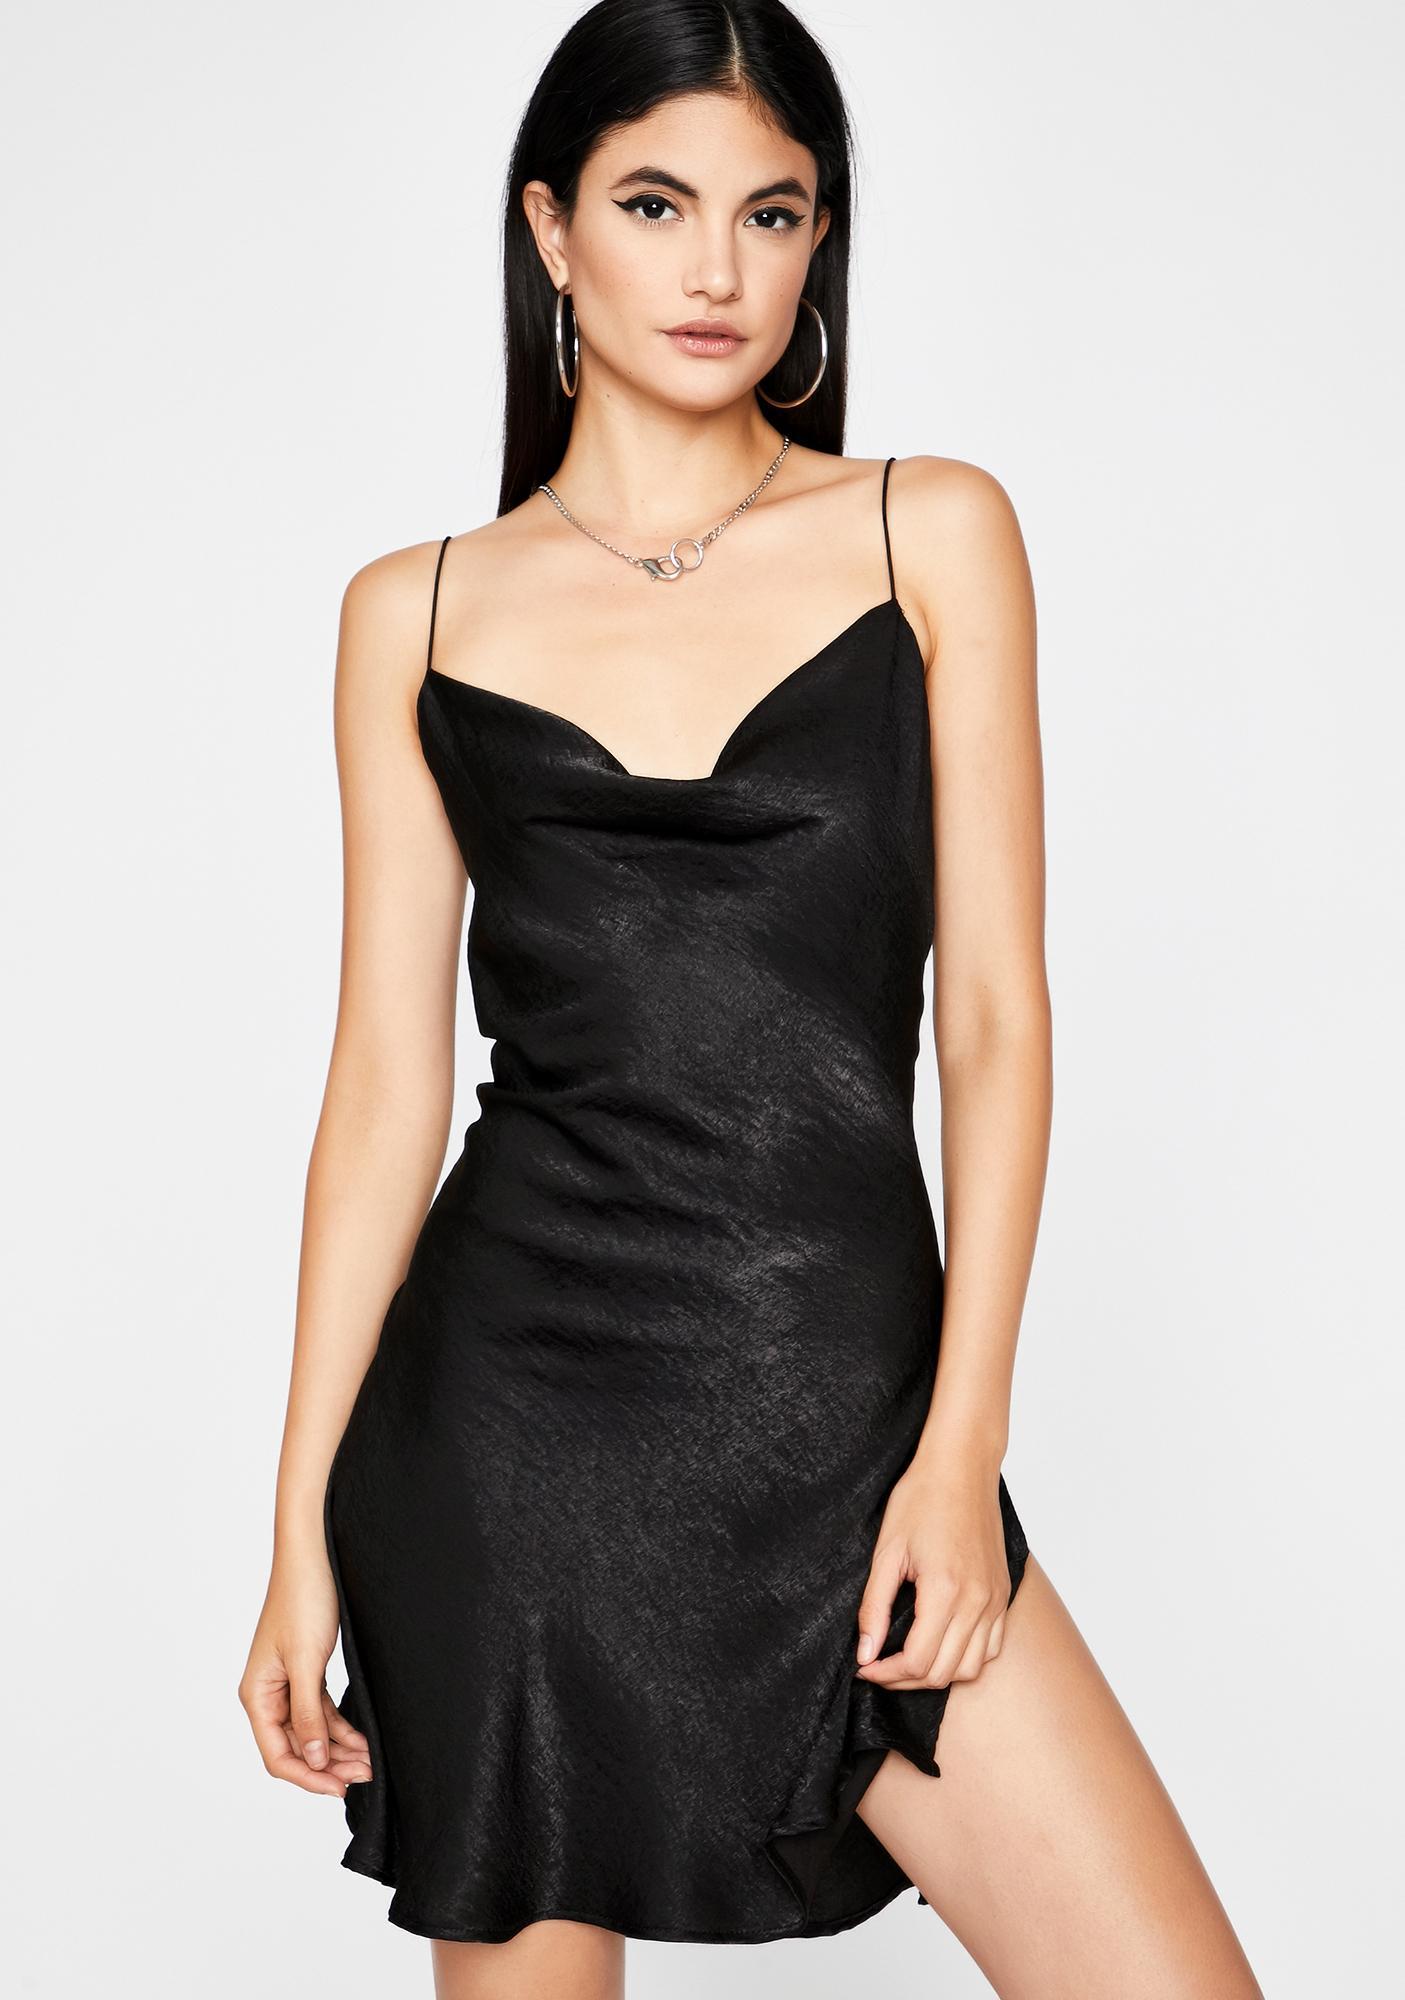 Naughty Subtle Temptations Mini Dress